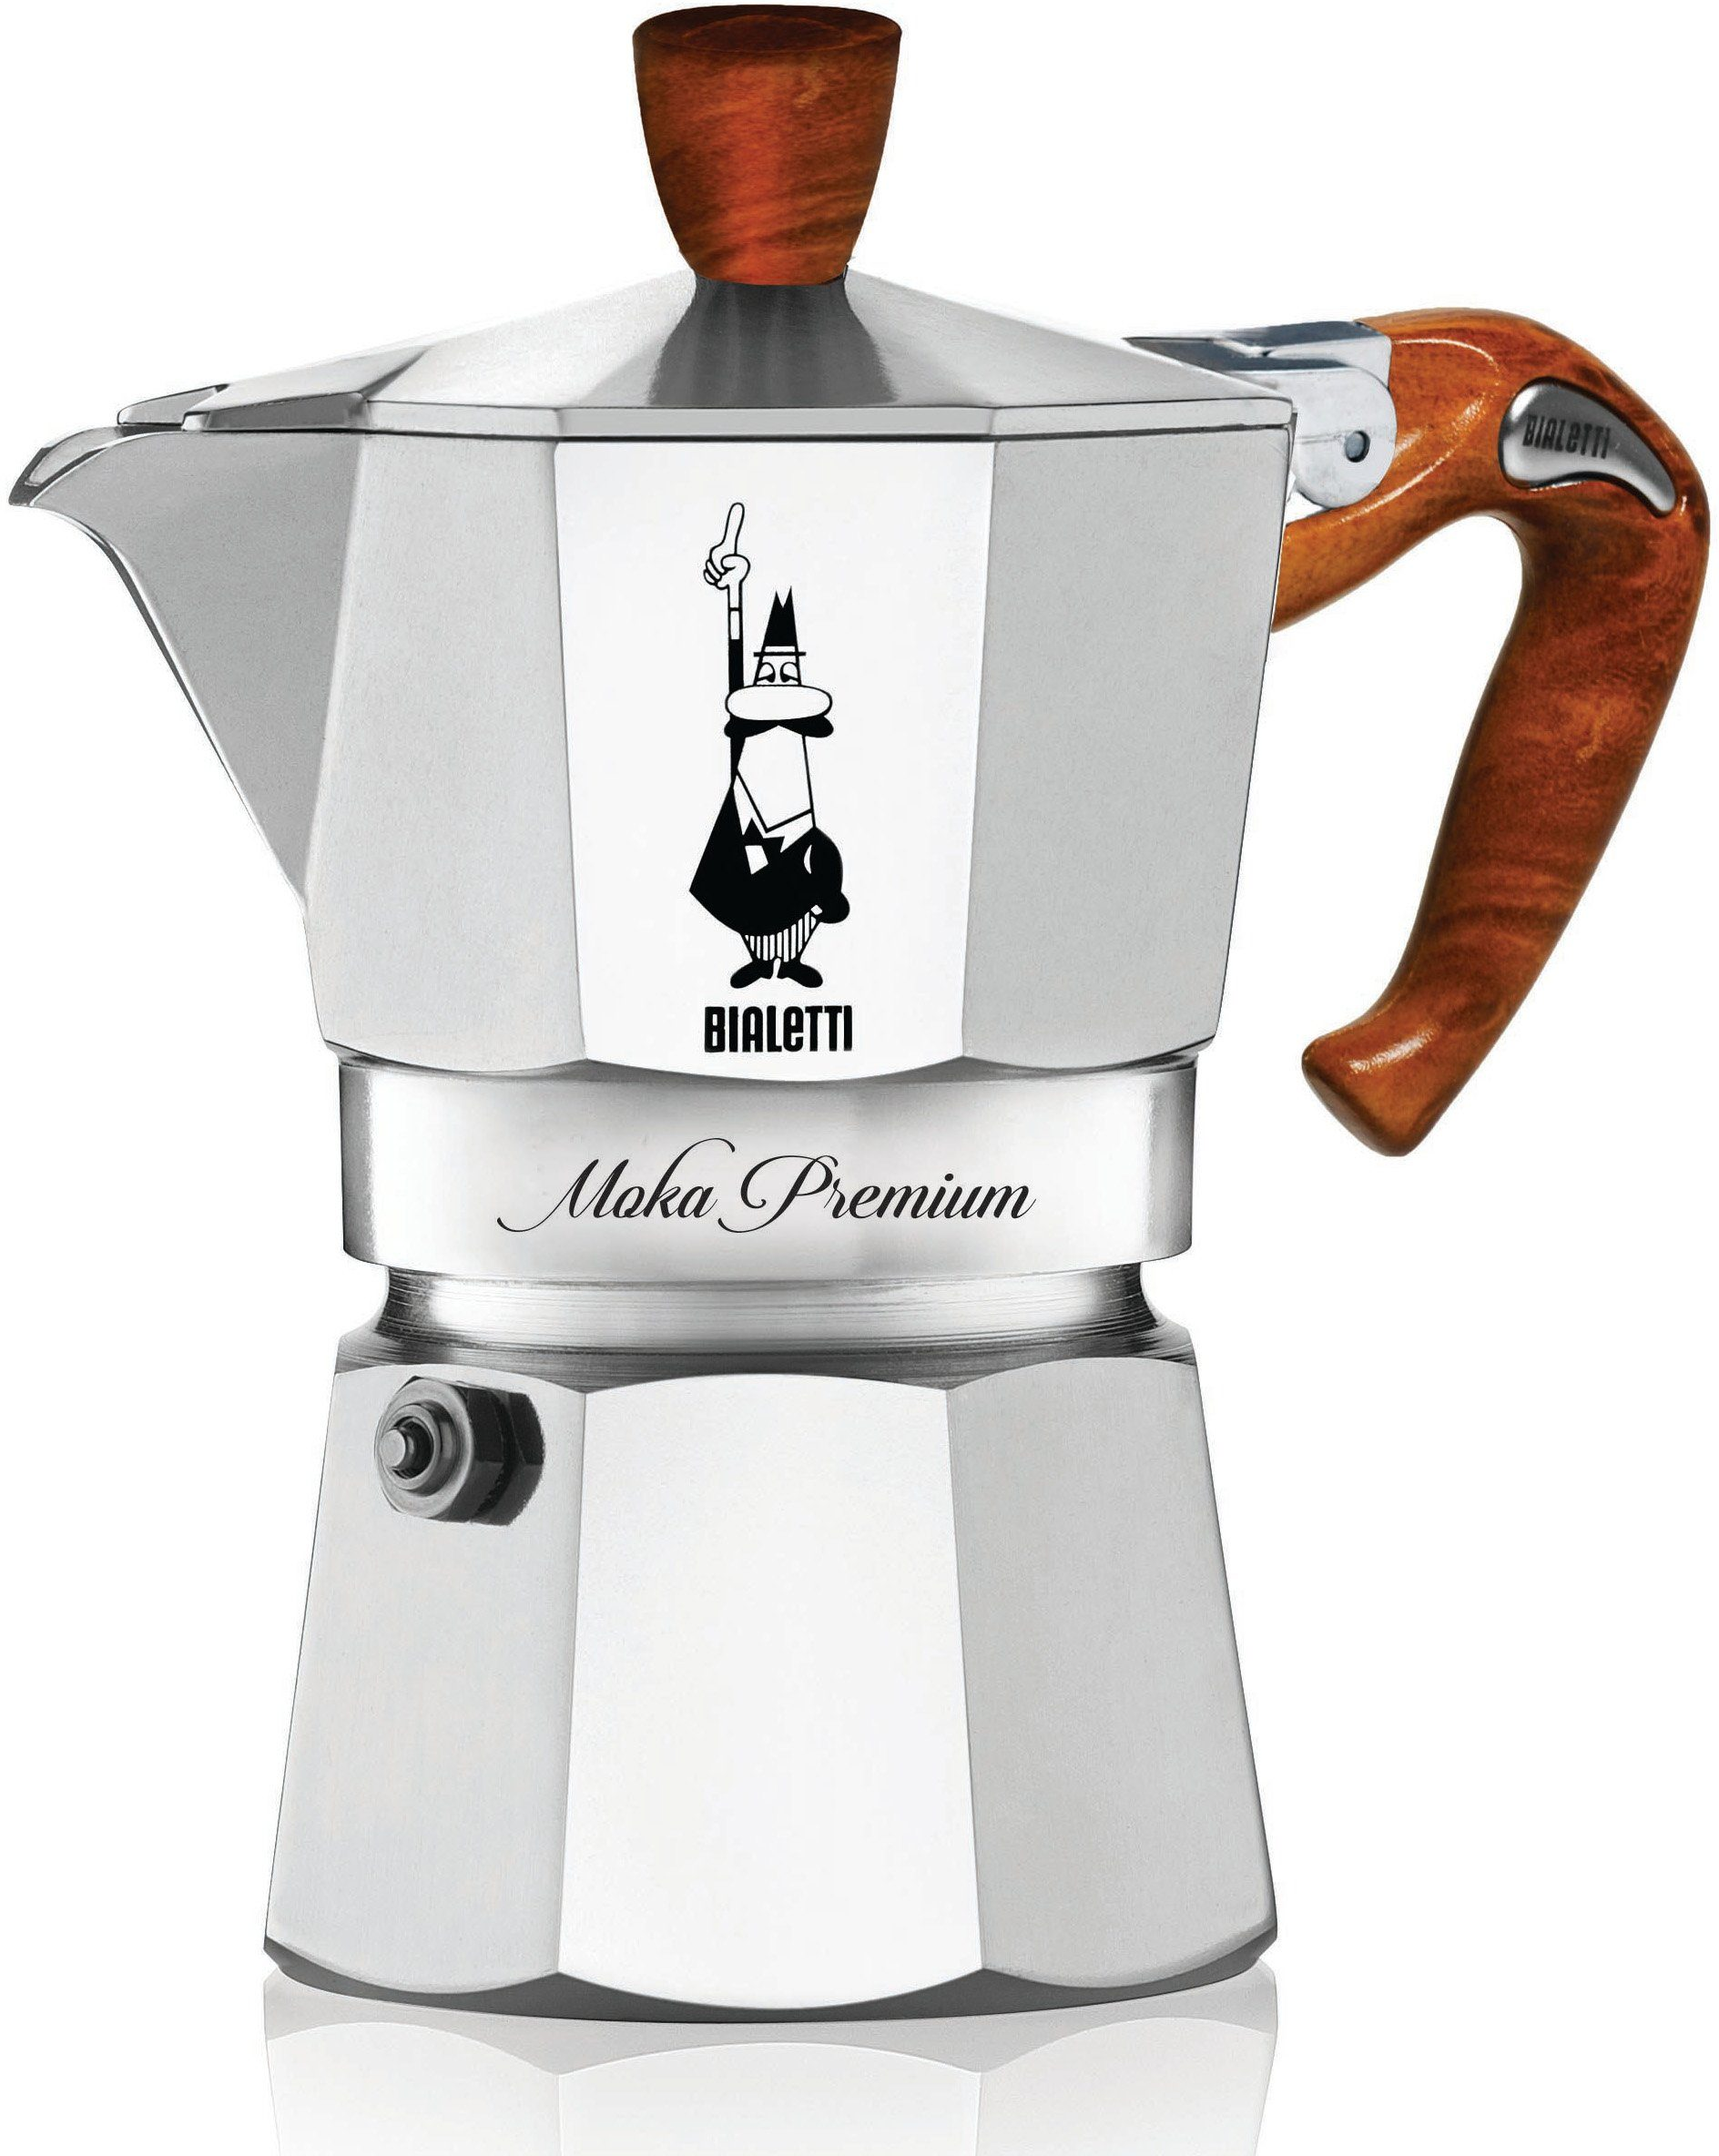 BIALETTI Espressokocher, Aluminium, Holzimitat-Griff, 6 Tassen, »MOKA EXPRESS«